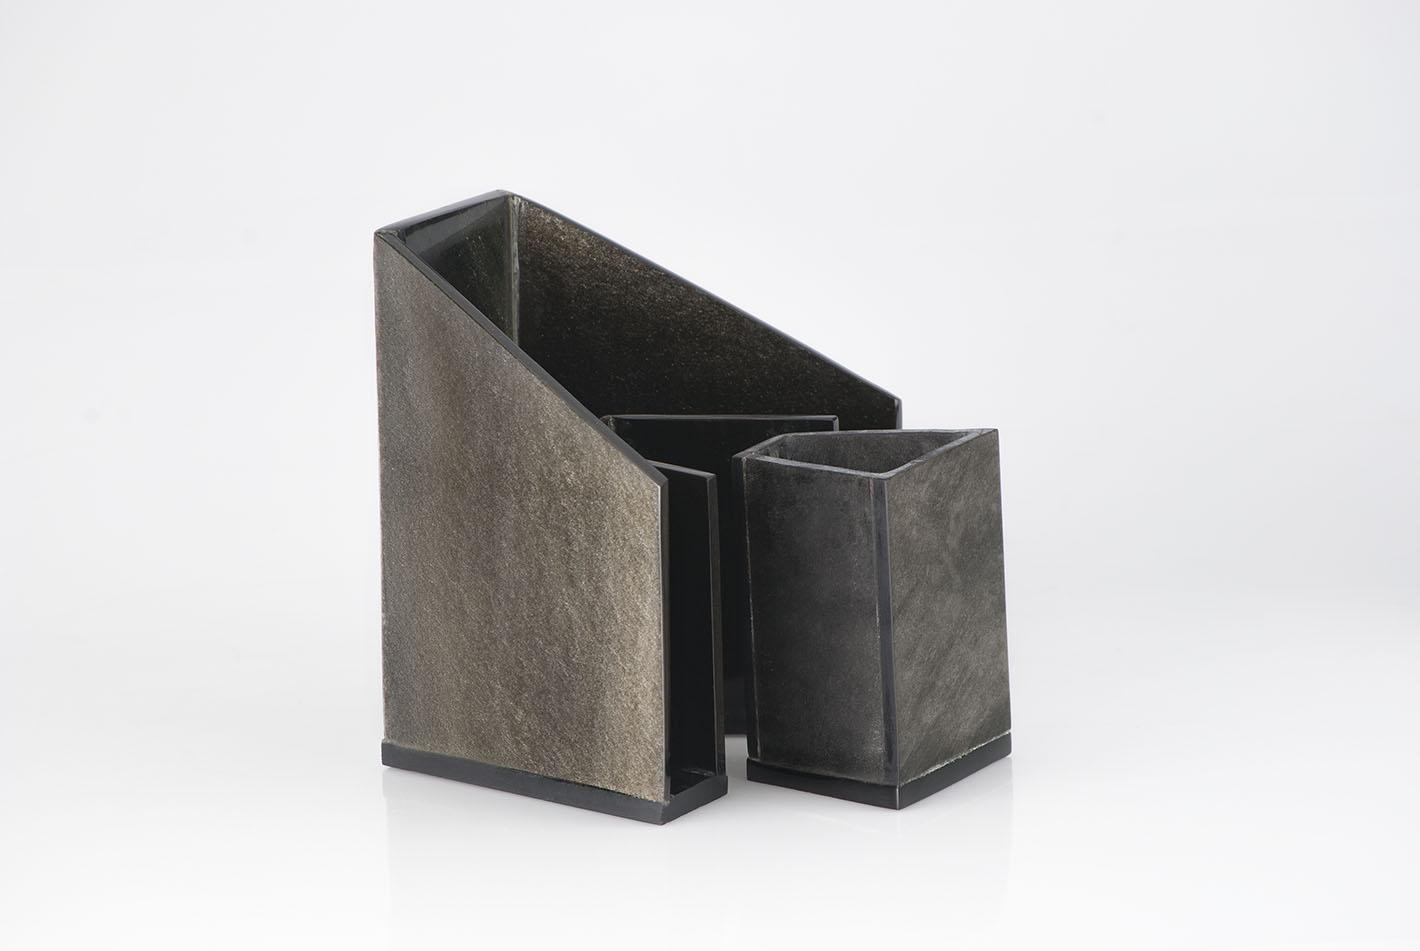 web22-Obsidian-Anahuac_DSC0182-Mexico-Design-Time-Marion-Friedmann.jpg